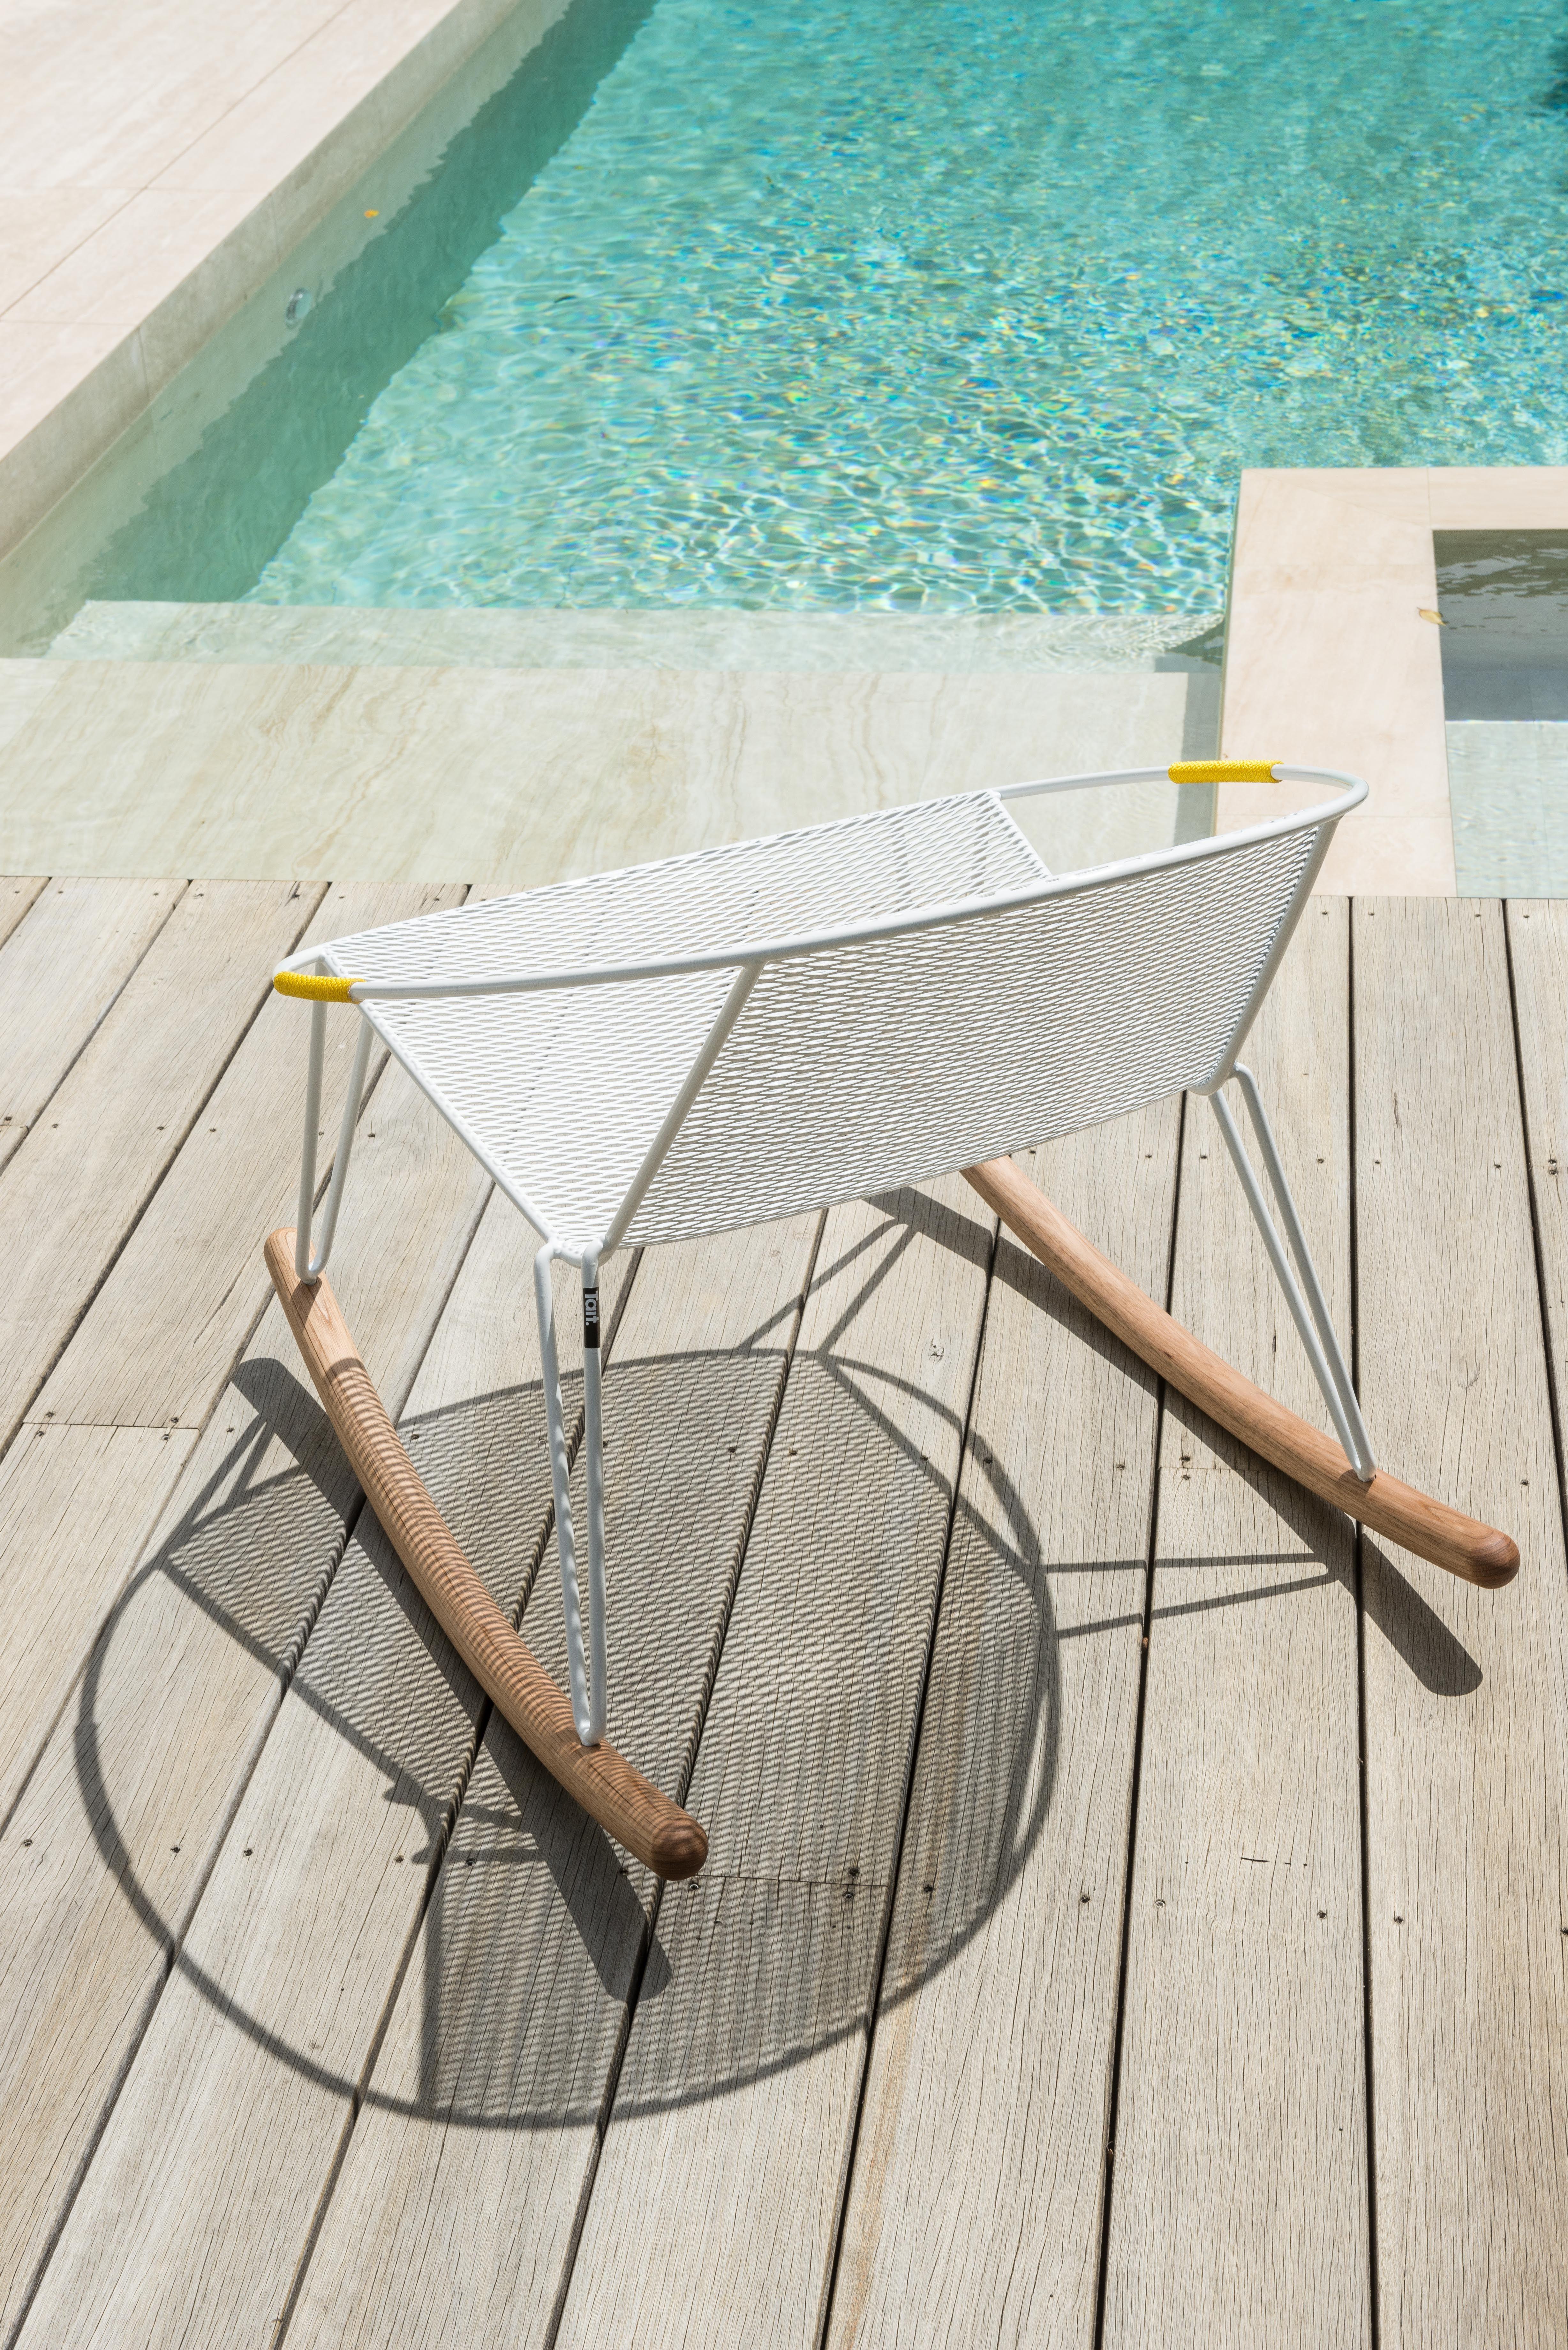 Outdoor Volley Rocker designed by Adam Goodrum for Tait ...